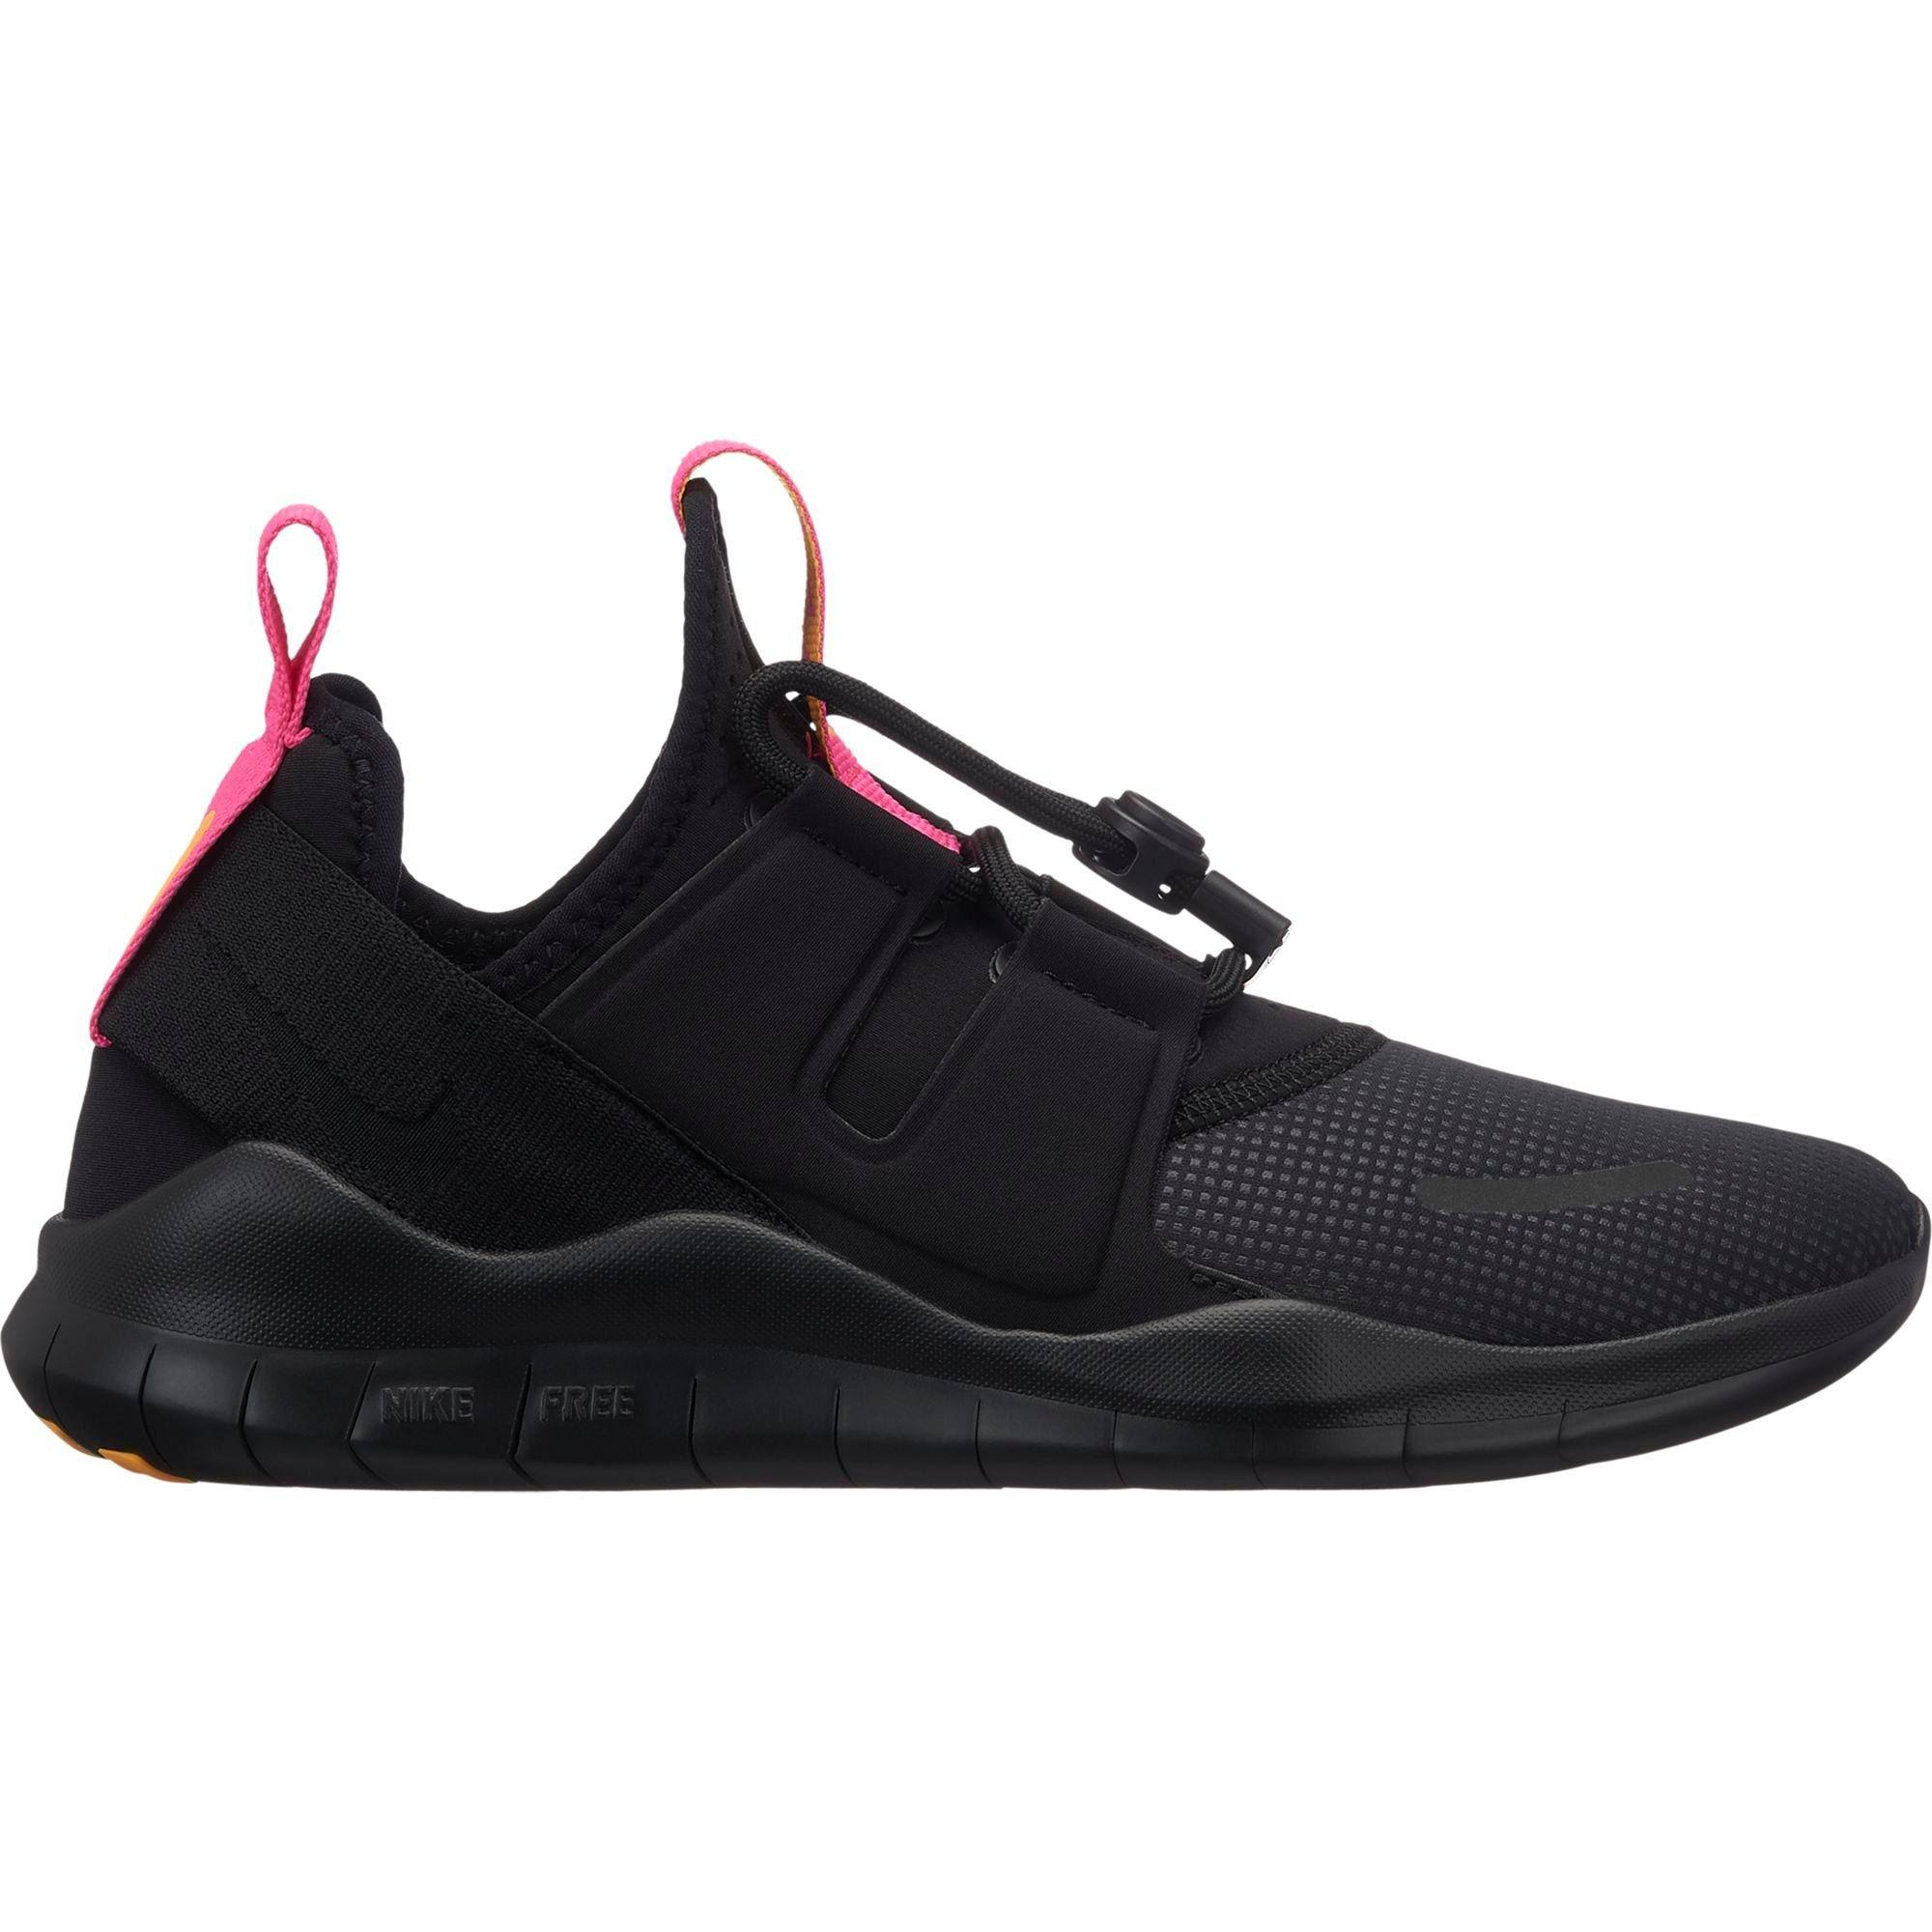 Laufschuh 8 2018 Blast Pink Schwarz 5 Free Rn Women's Cmtr Nike xXZ1aq